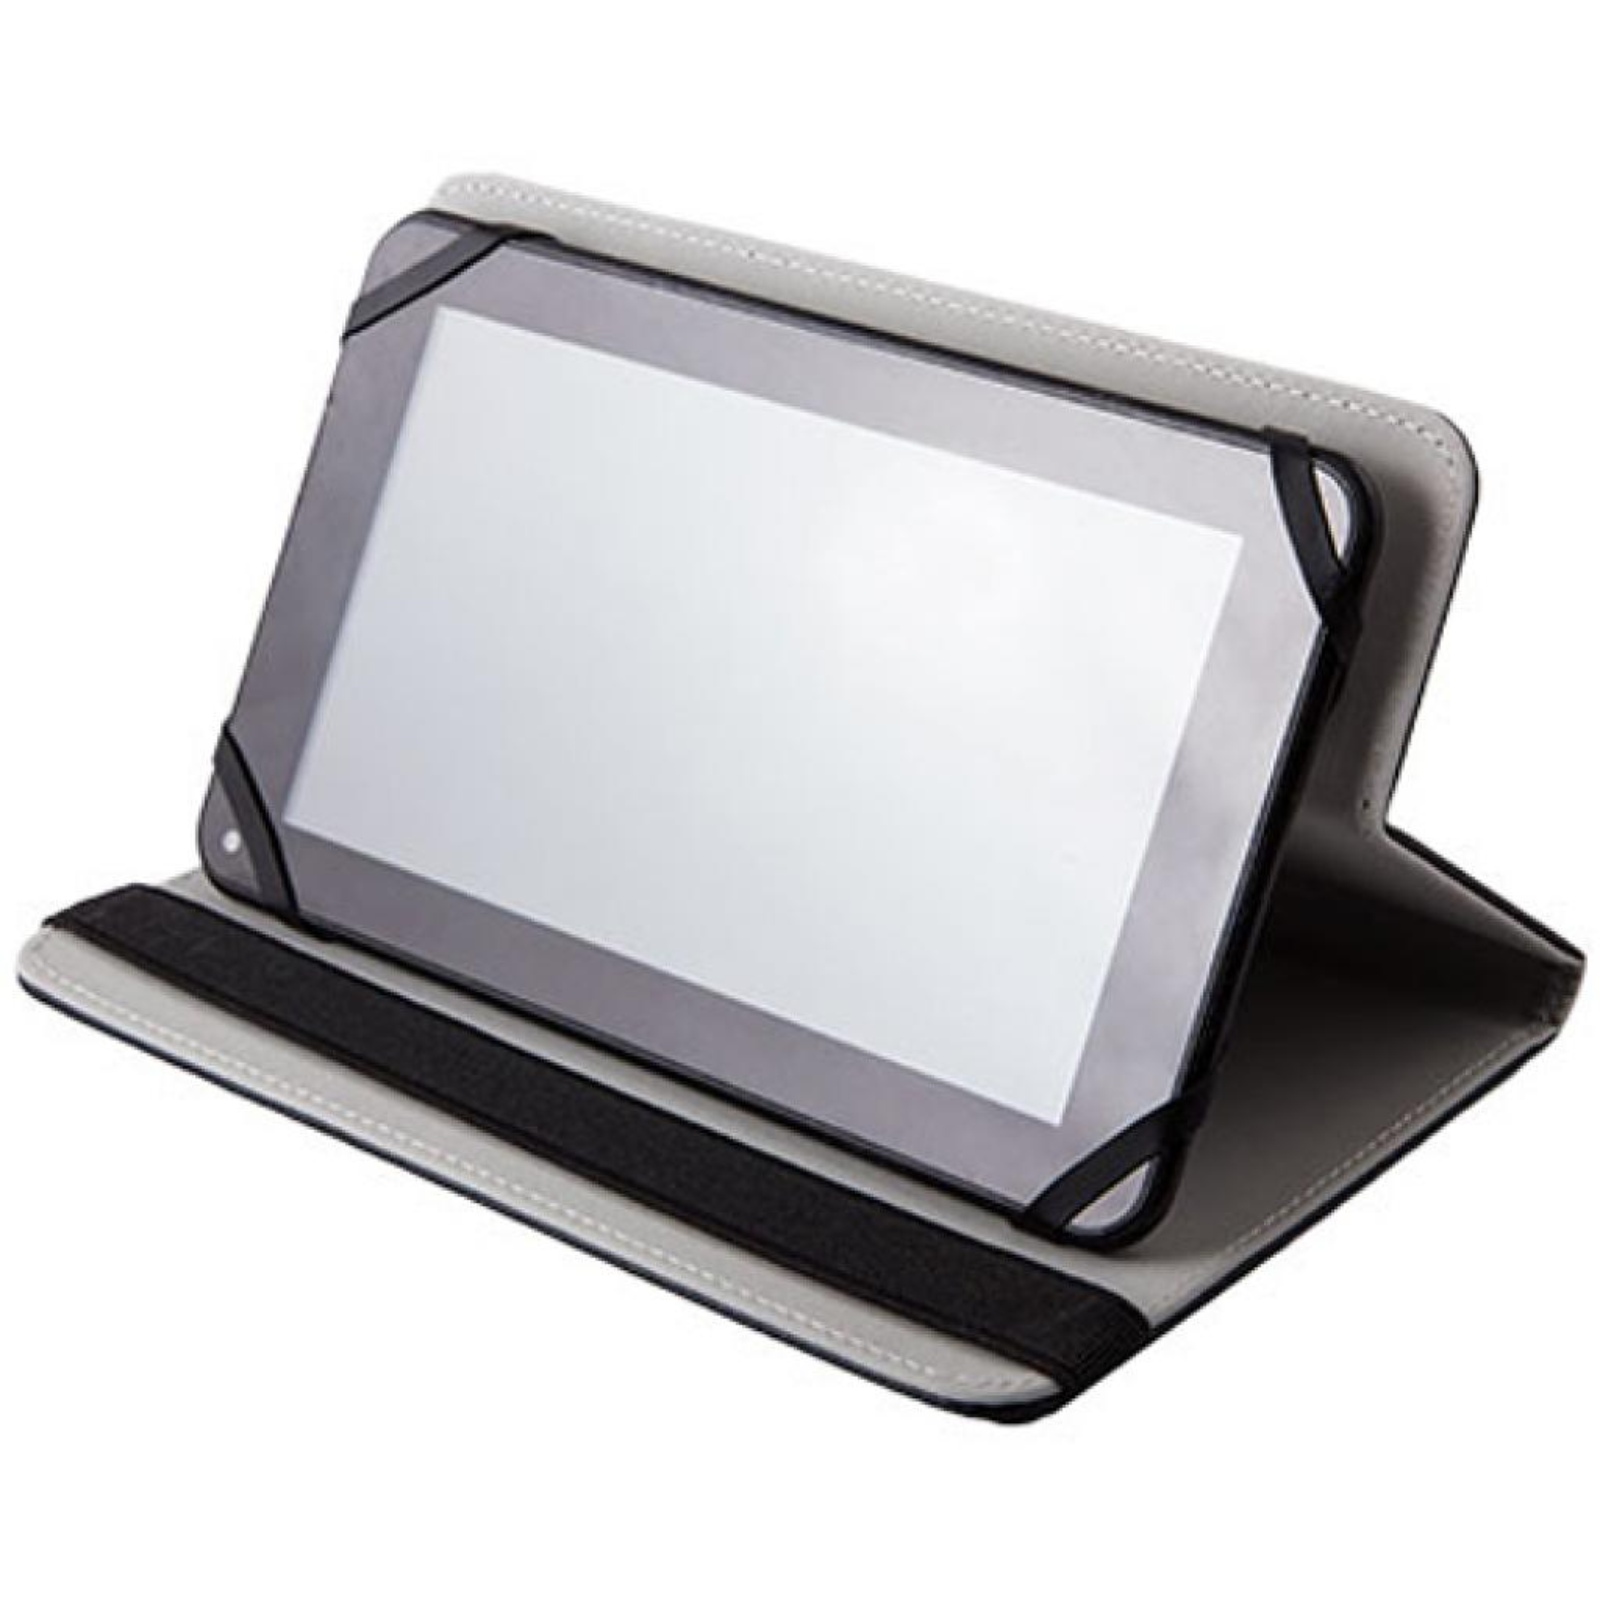 "Чехол для планшета Drobak 7"" Universal stand Black (216879) изображение 3"